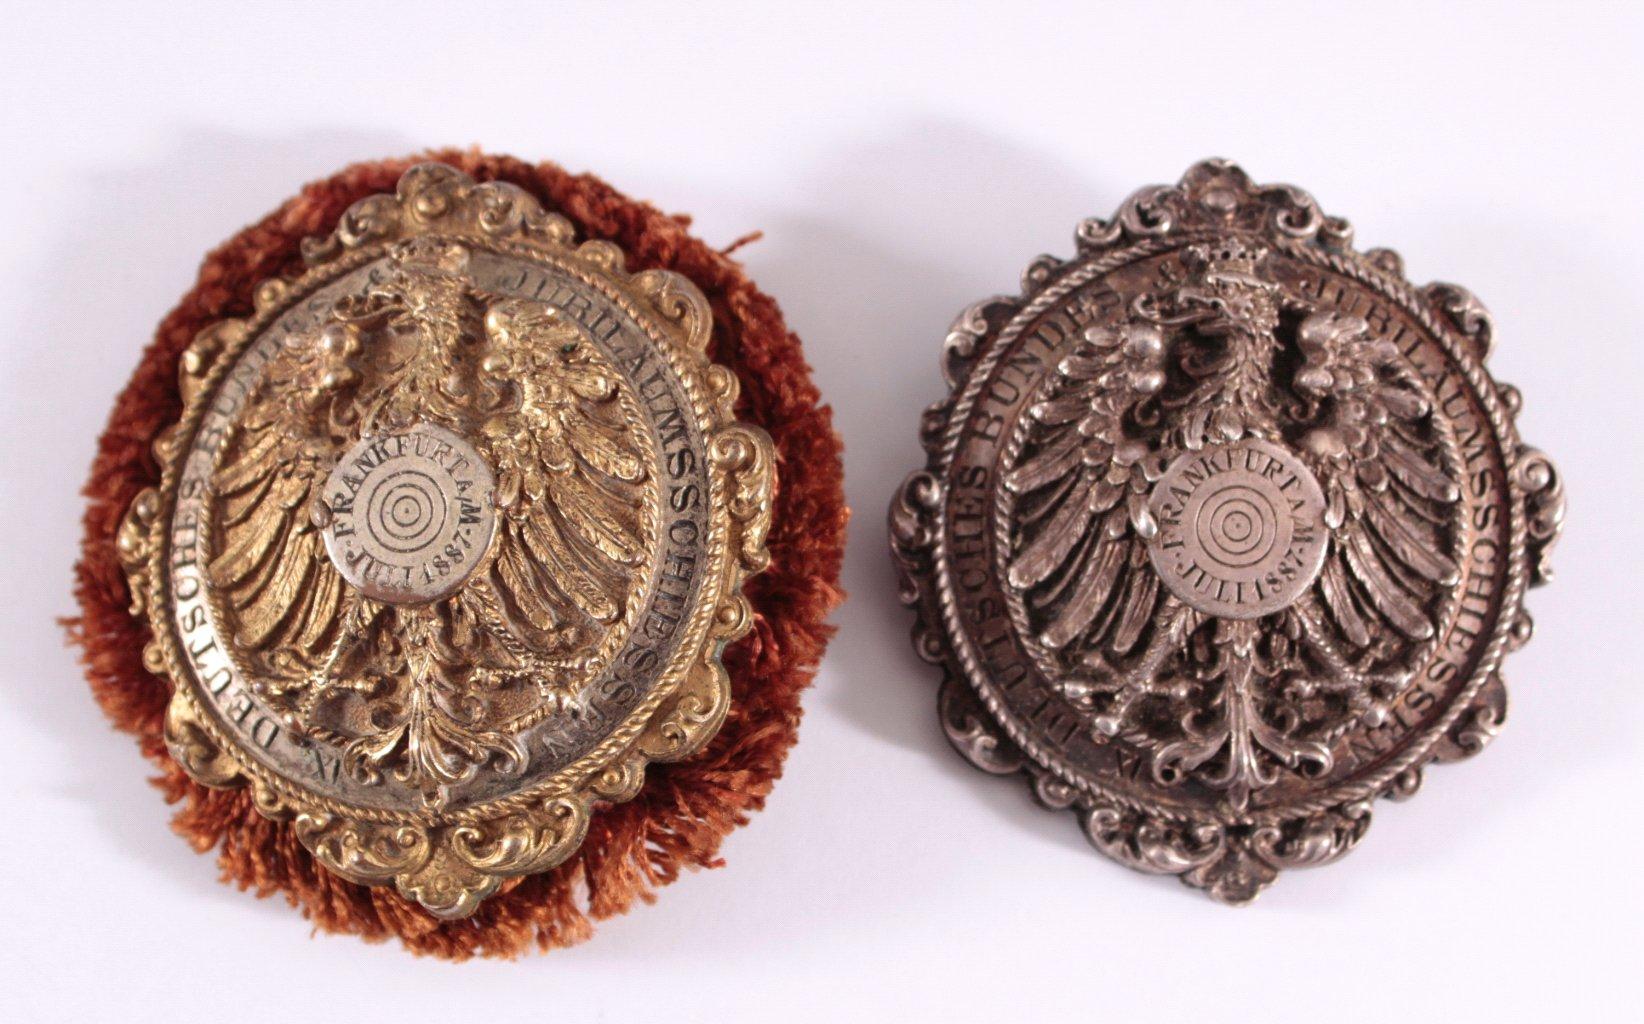 2 Abzeichen IX. Bundeschützenfest Frankfurt 1887